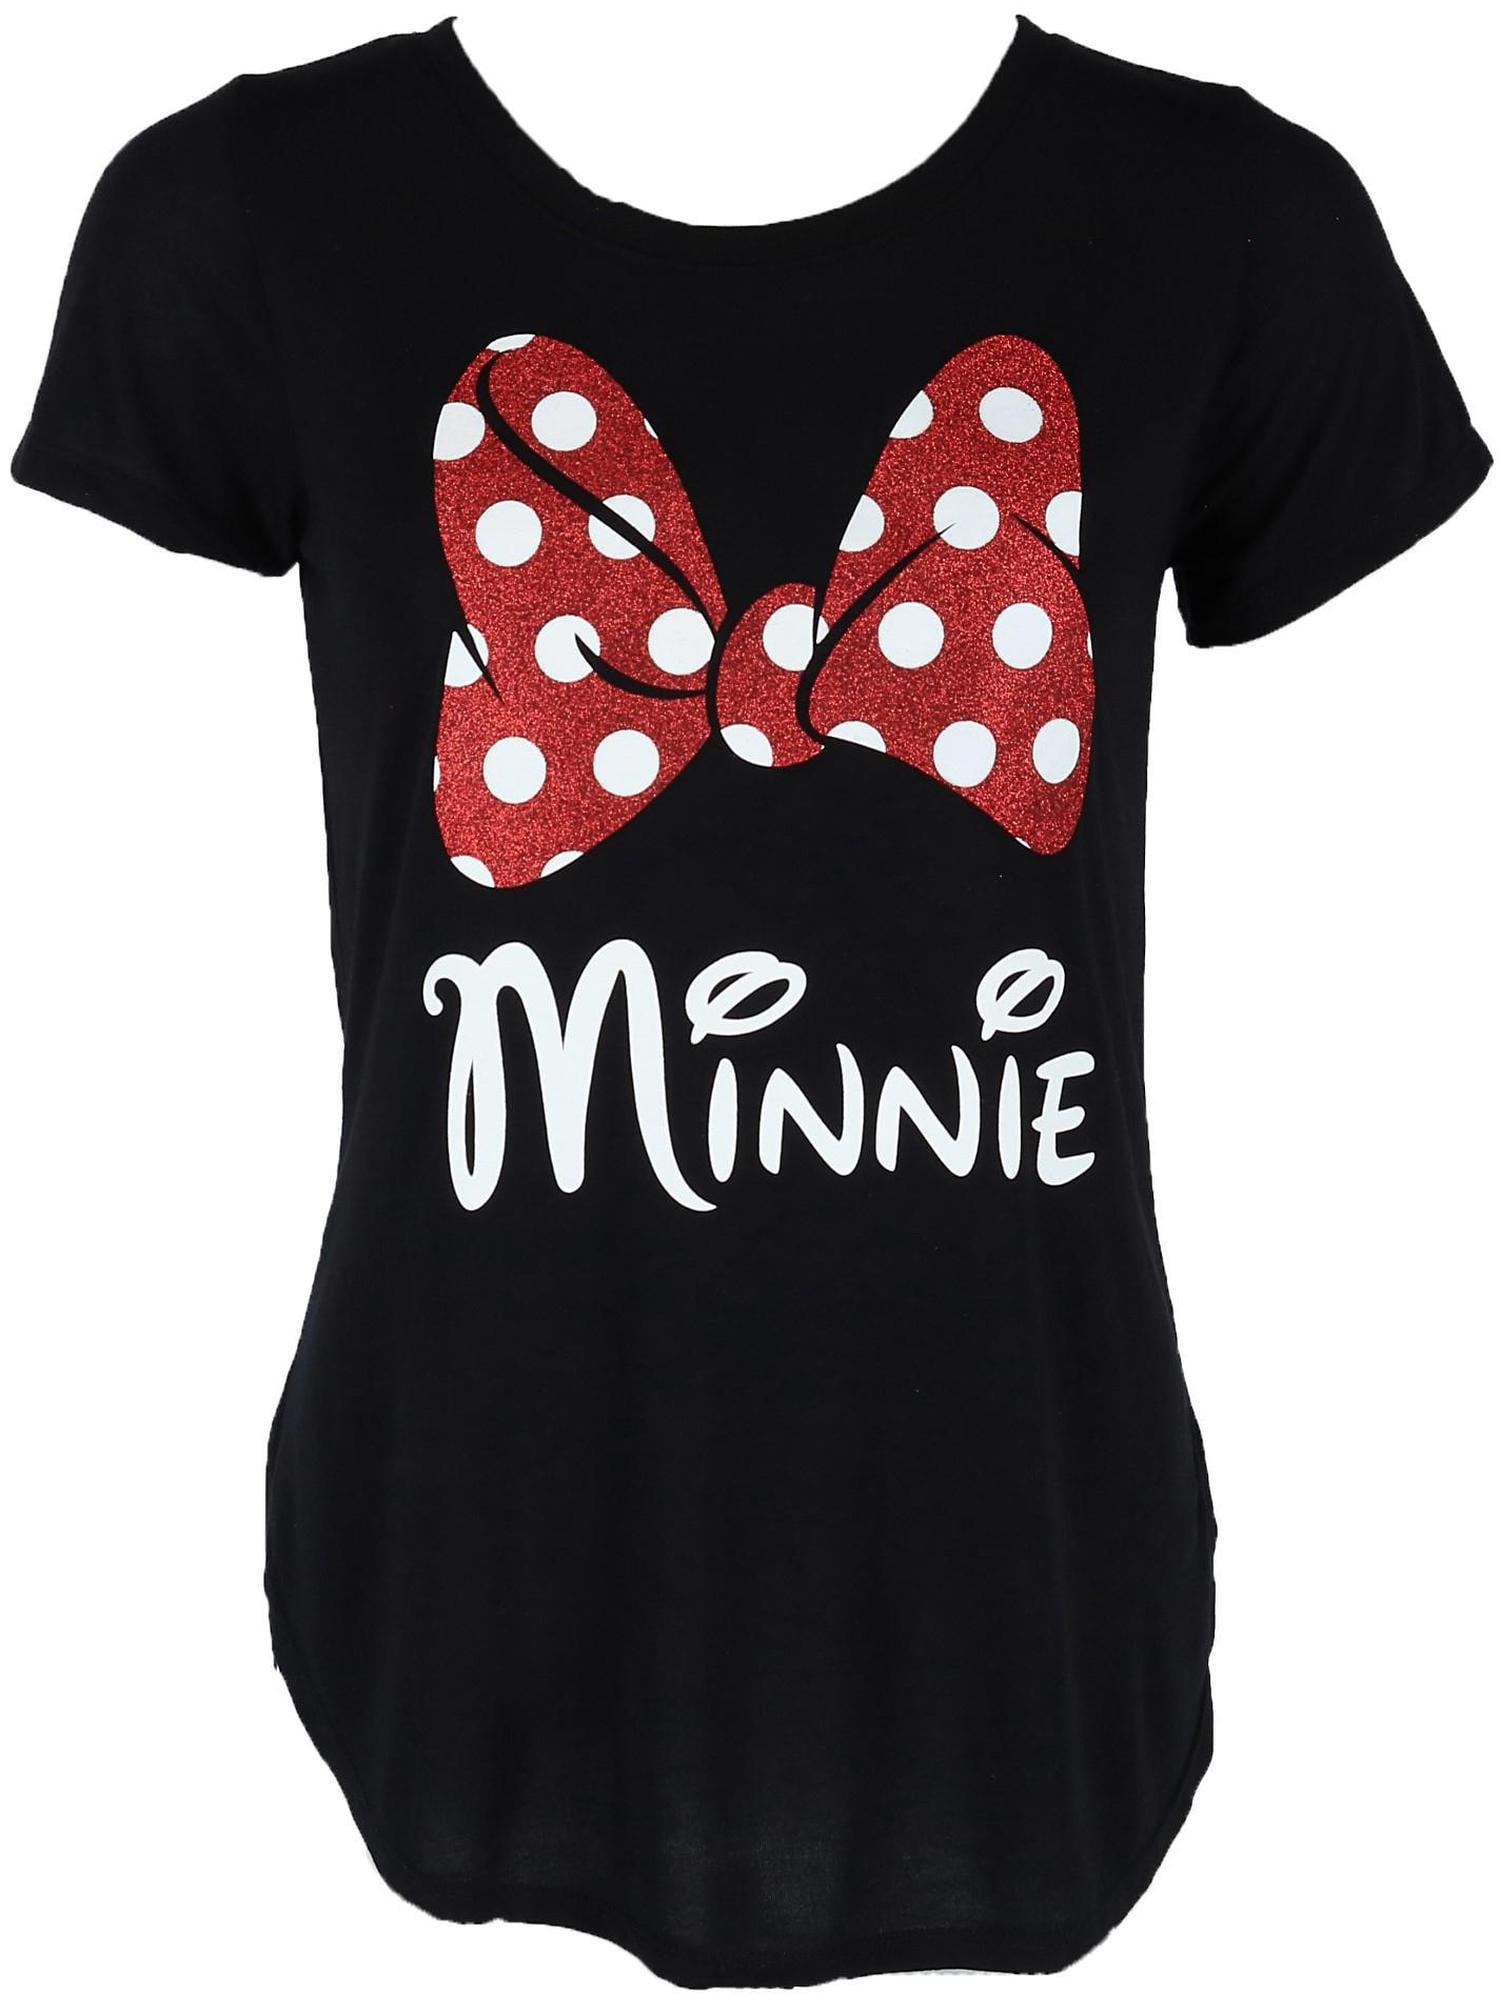 04c2cb275 Disney - Women's Fashion Glitter Minnie Mouse Bow T Shirt, Black -  Walmart.com